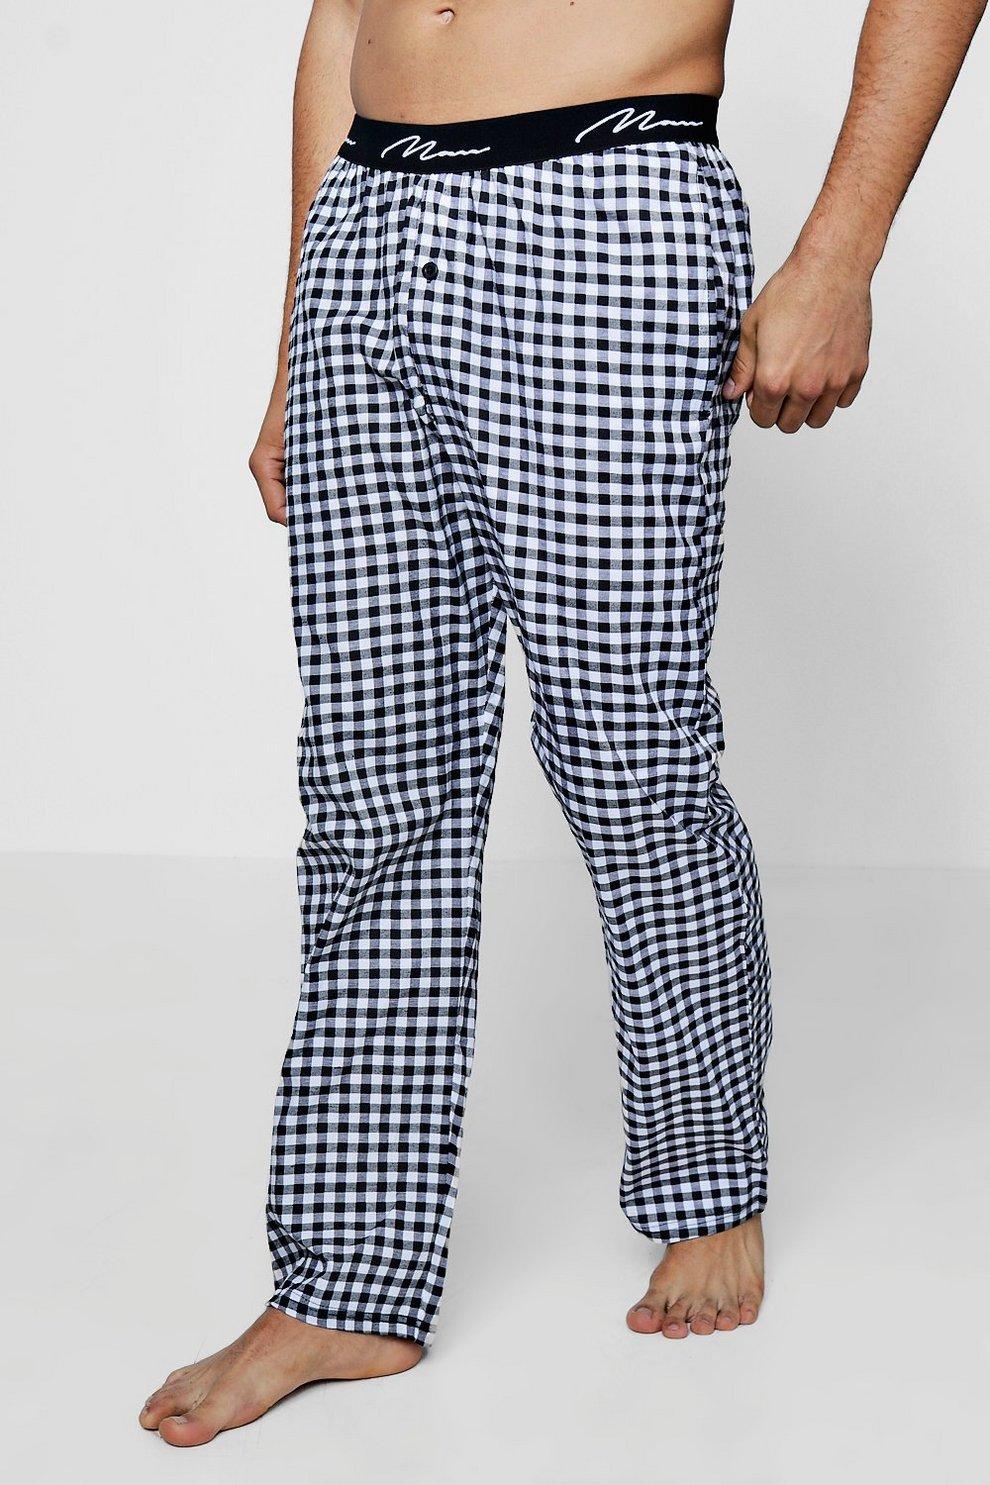 Navy And Grey Checked Pyjama Pants  383dbe670